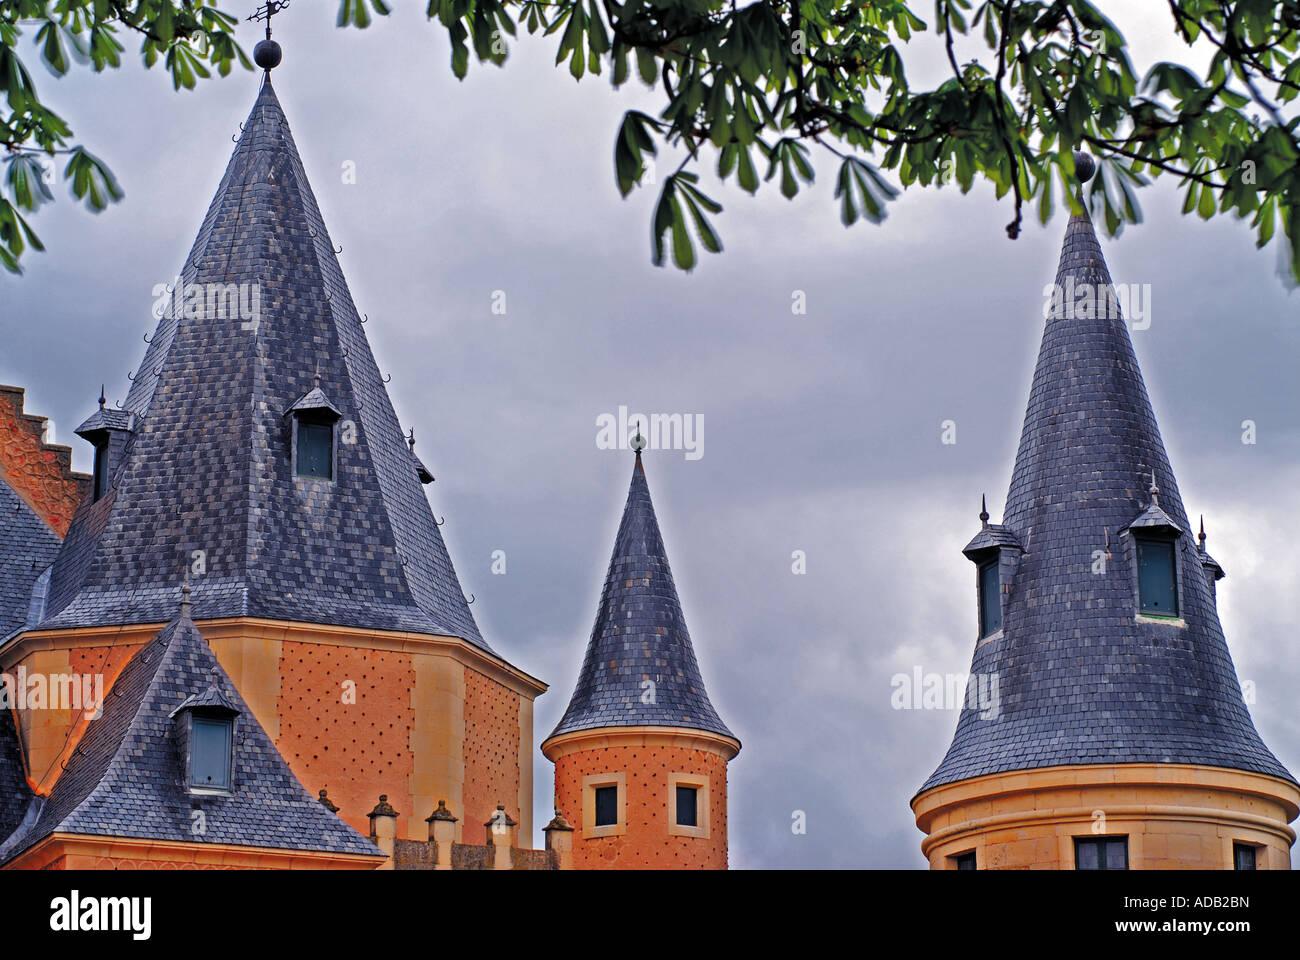 Towers of the Alcazar, Segovia, Castilla-Leon, Spain - Stock Image